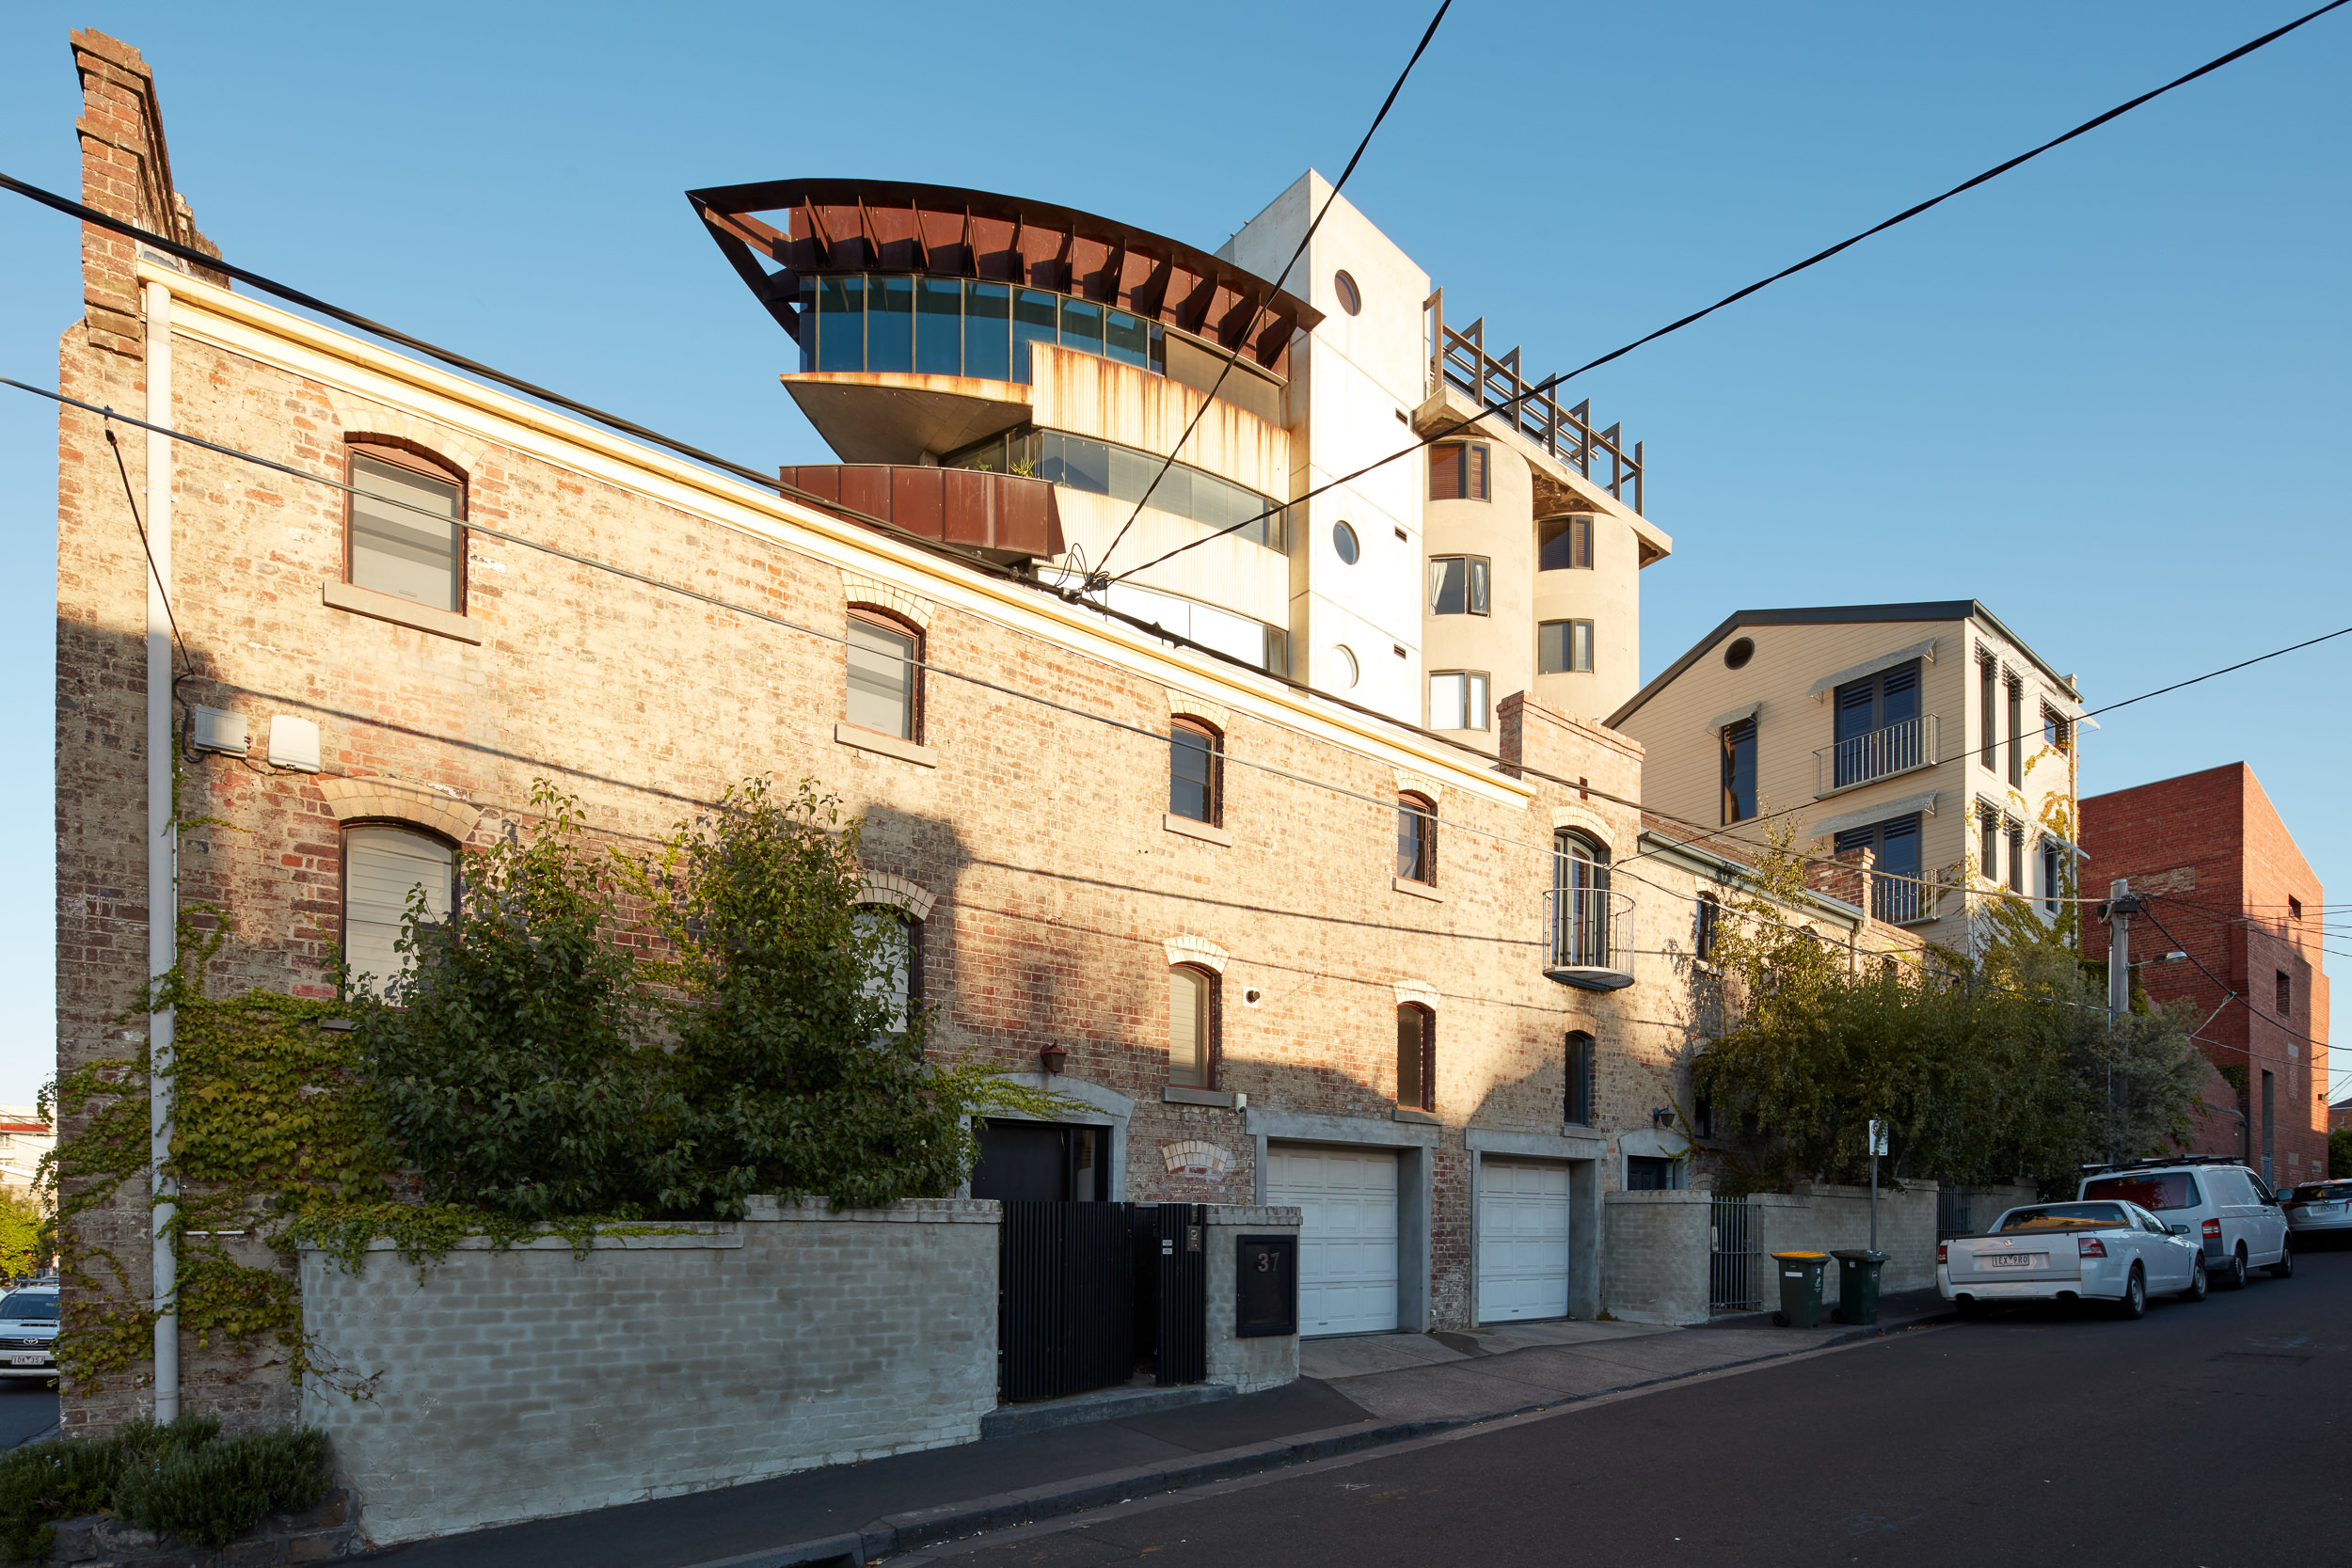 nathankdavis-nathan-k-davis-1nkd-architecture-architectural-photography-interior-exterior-design-real-estate-richmond-abinger-st-street-melbourne-12